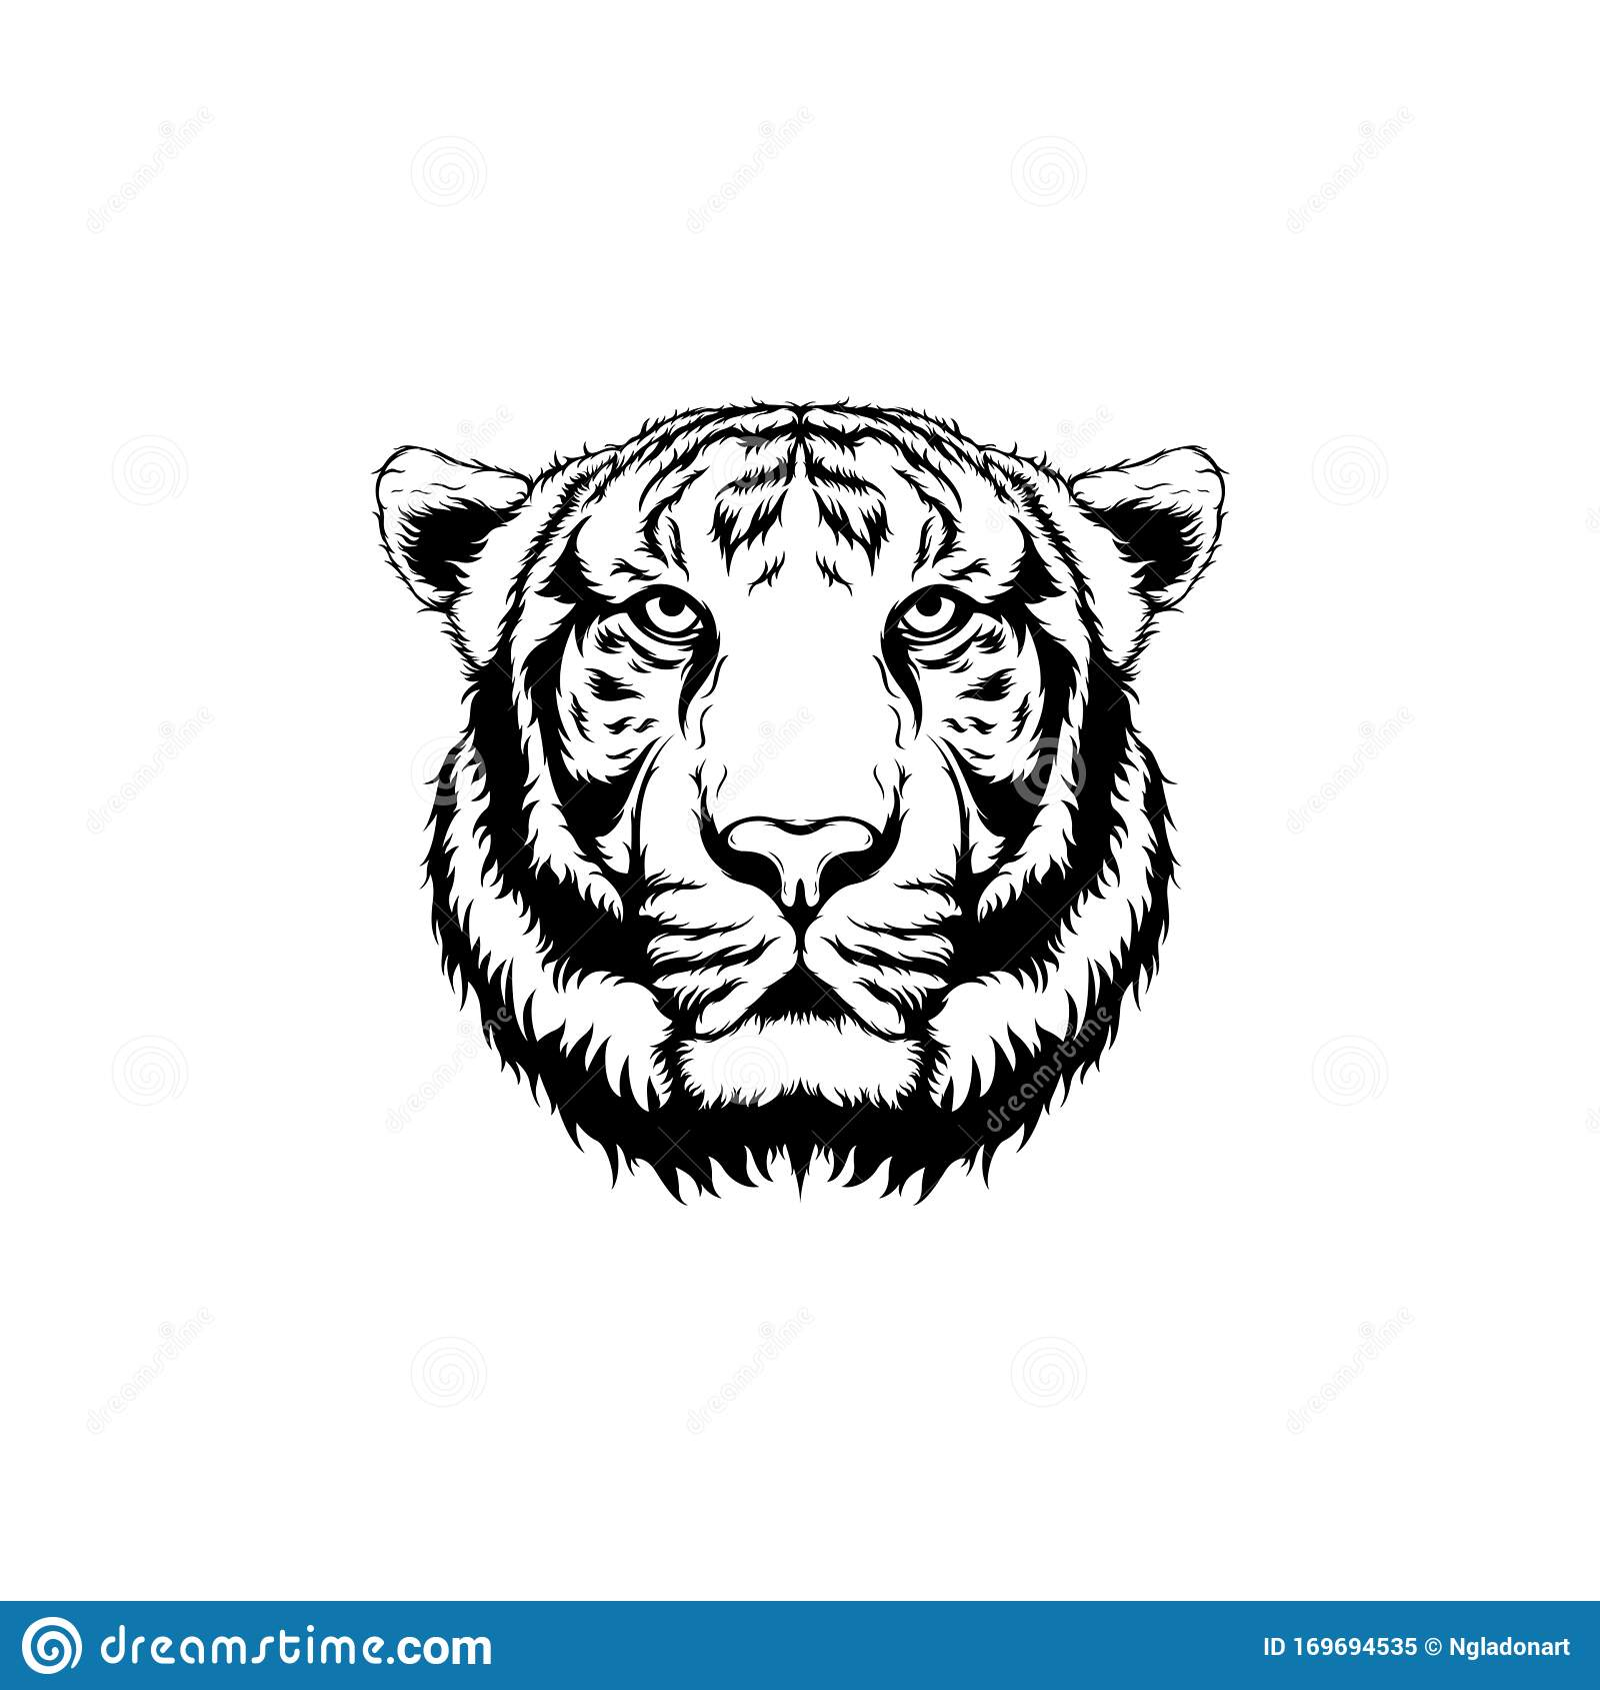 Tiger Face Line Art For Tattoo Stock Vector - Illustration ...